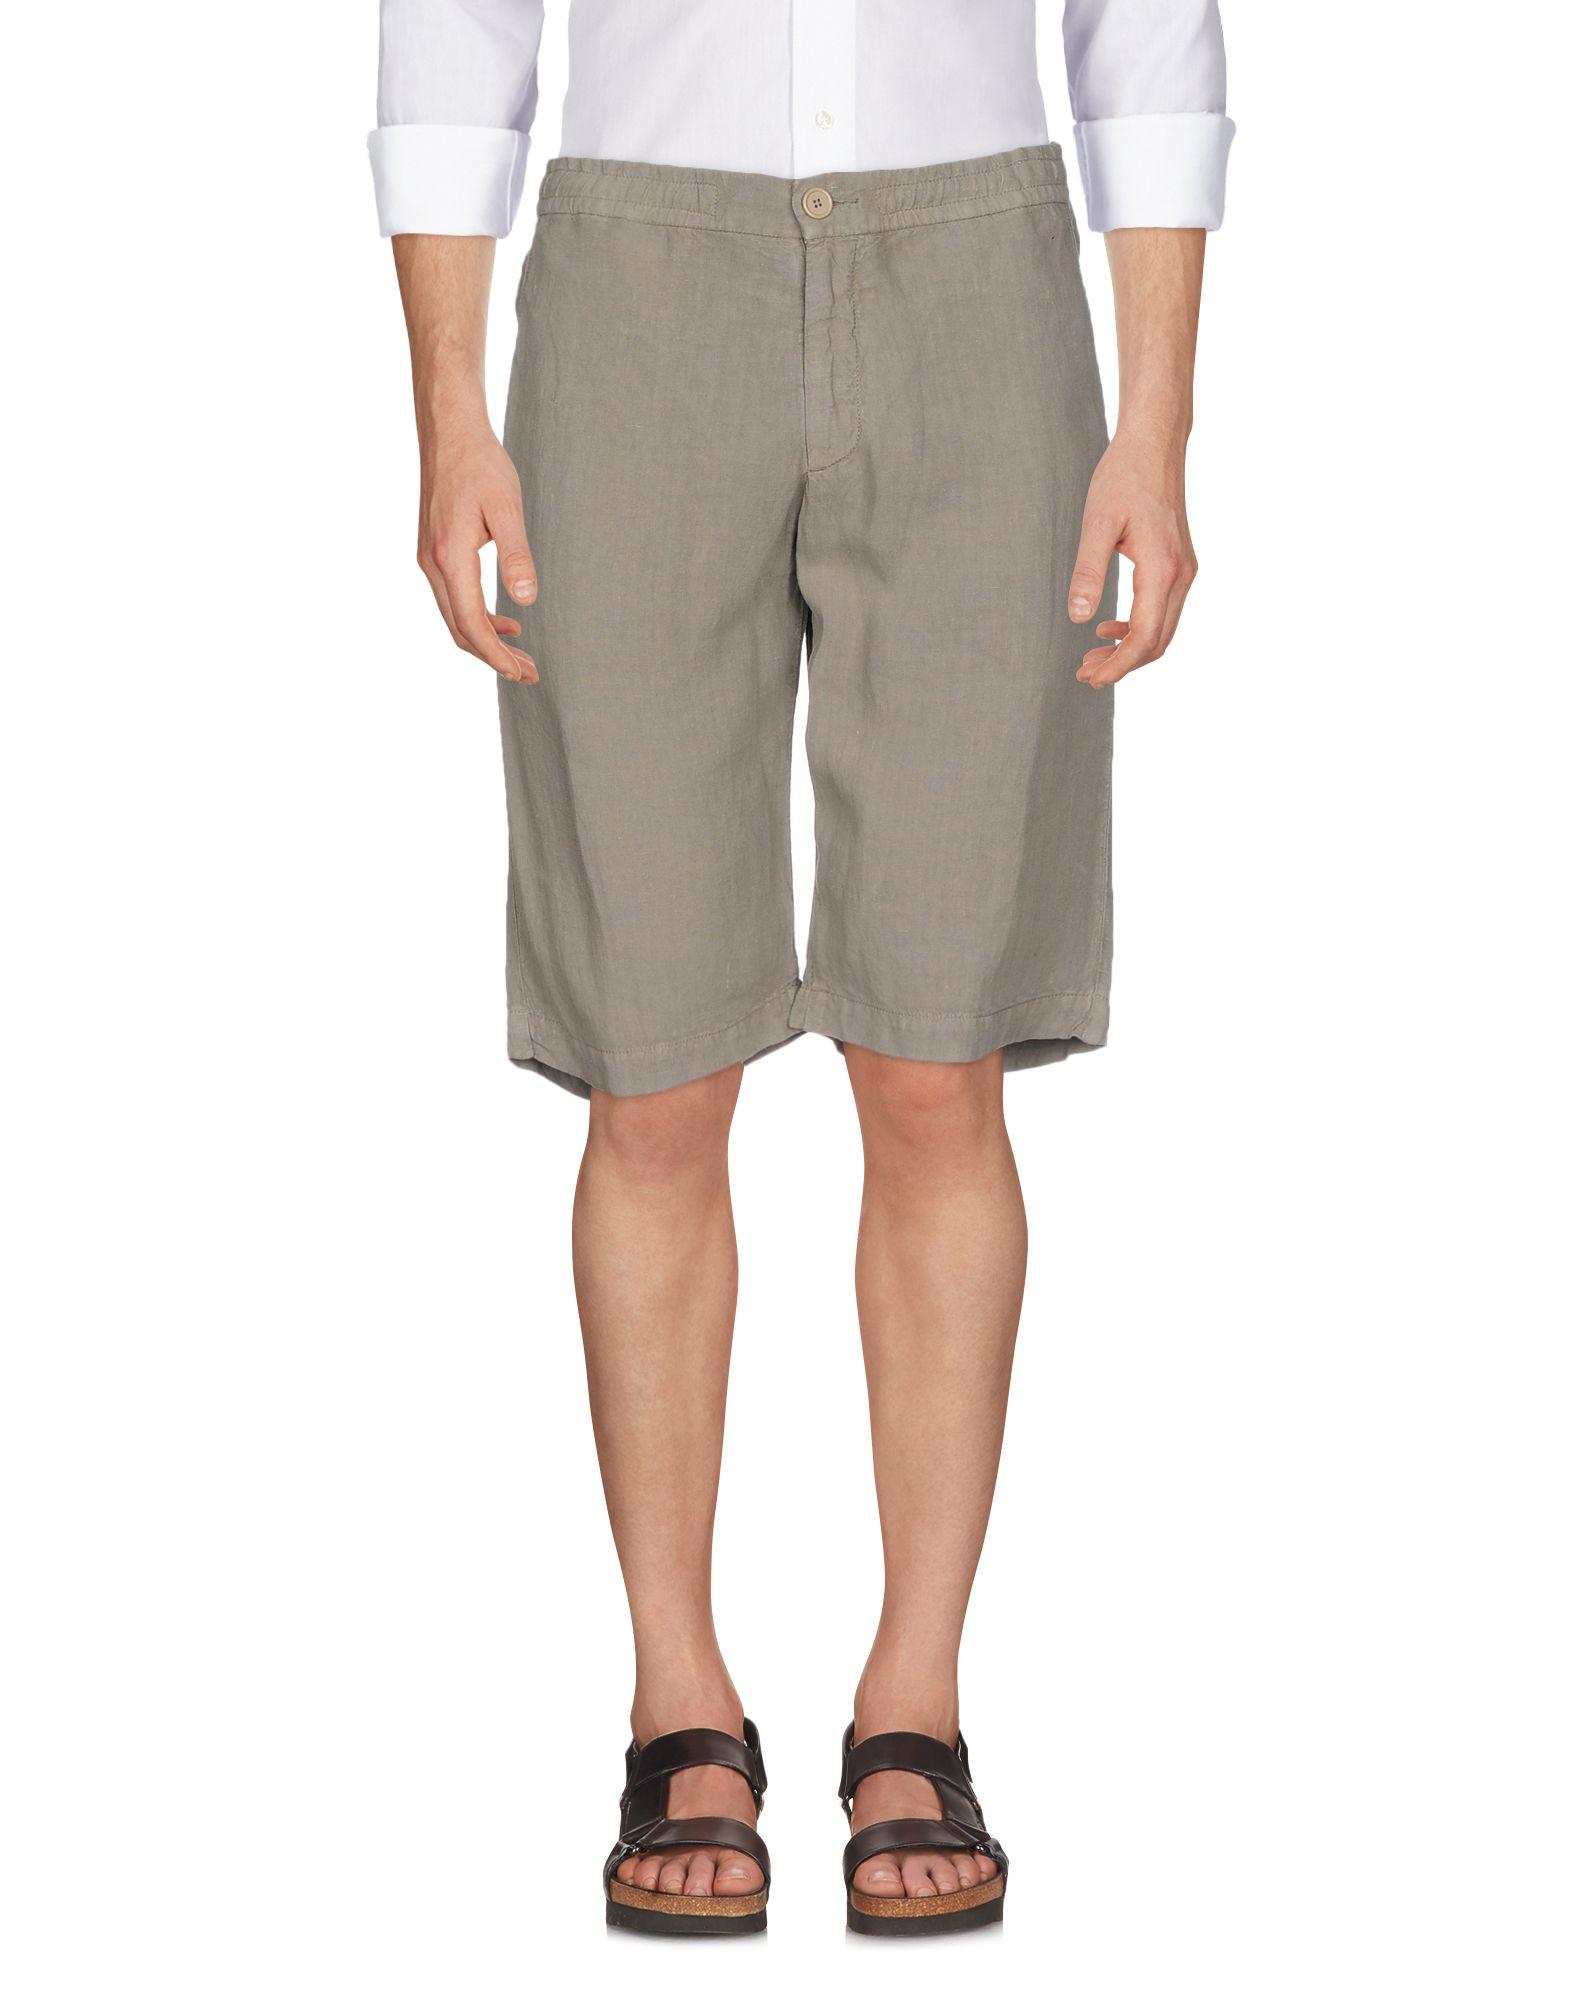 Shorts 13104403RX & Bermuda Zzegna Uomo - 13104403RX Shorts 798a19